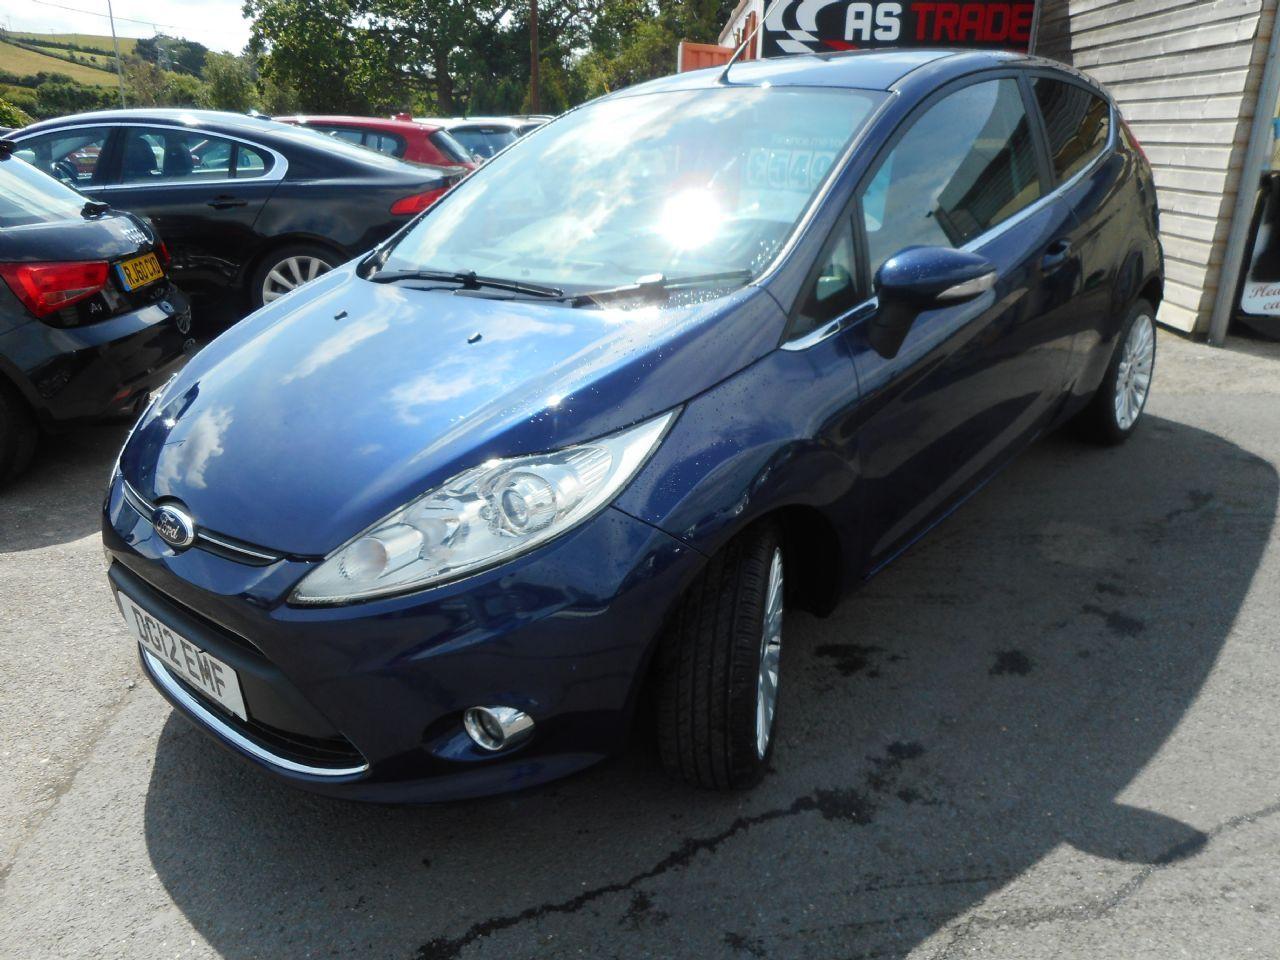 FORD Fiesta Titanium 1.4 096 Auto (2012) - Picture 7